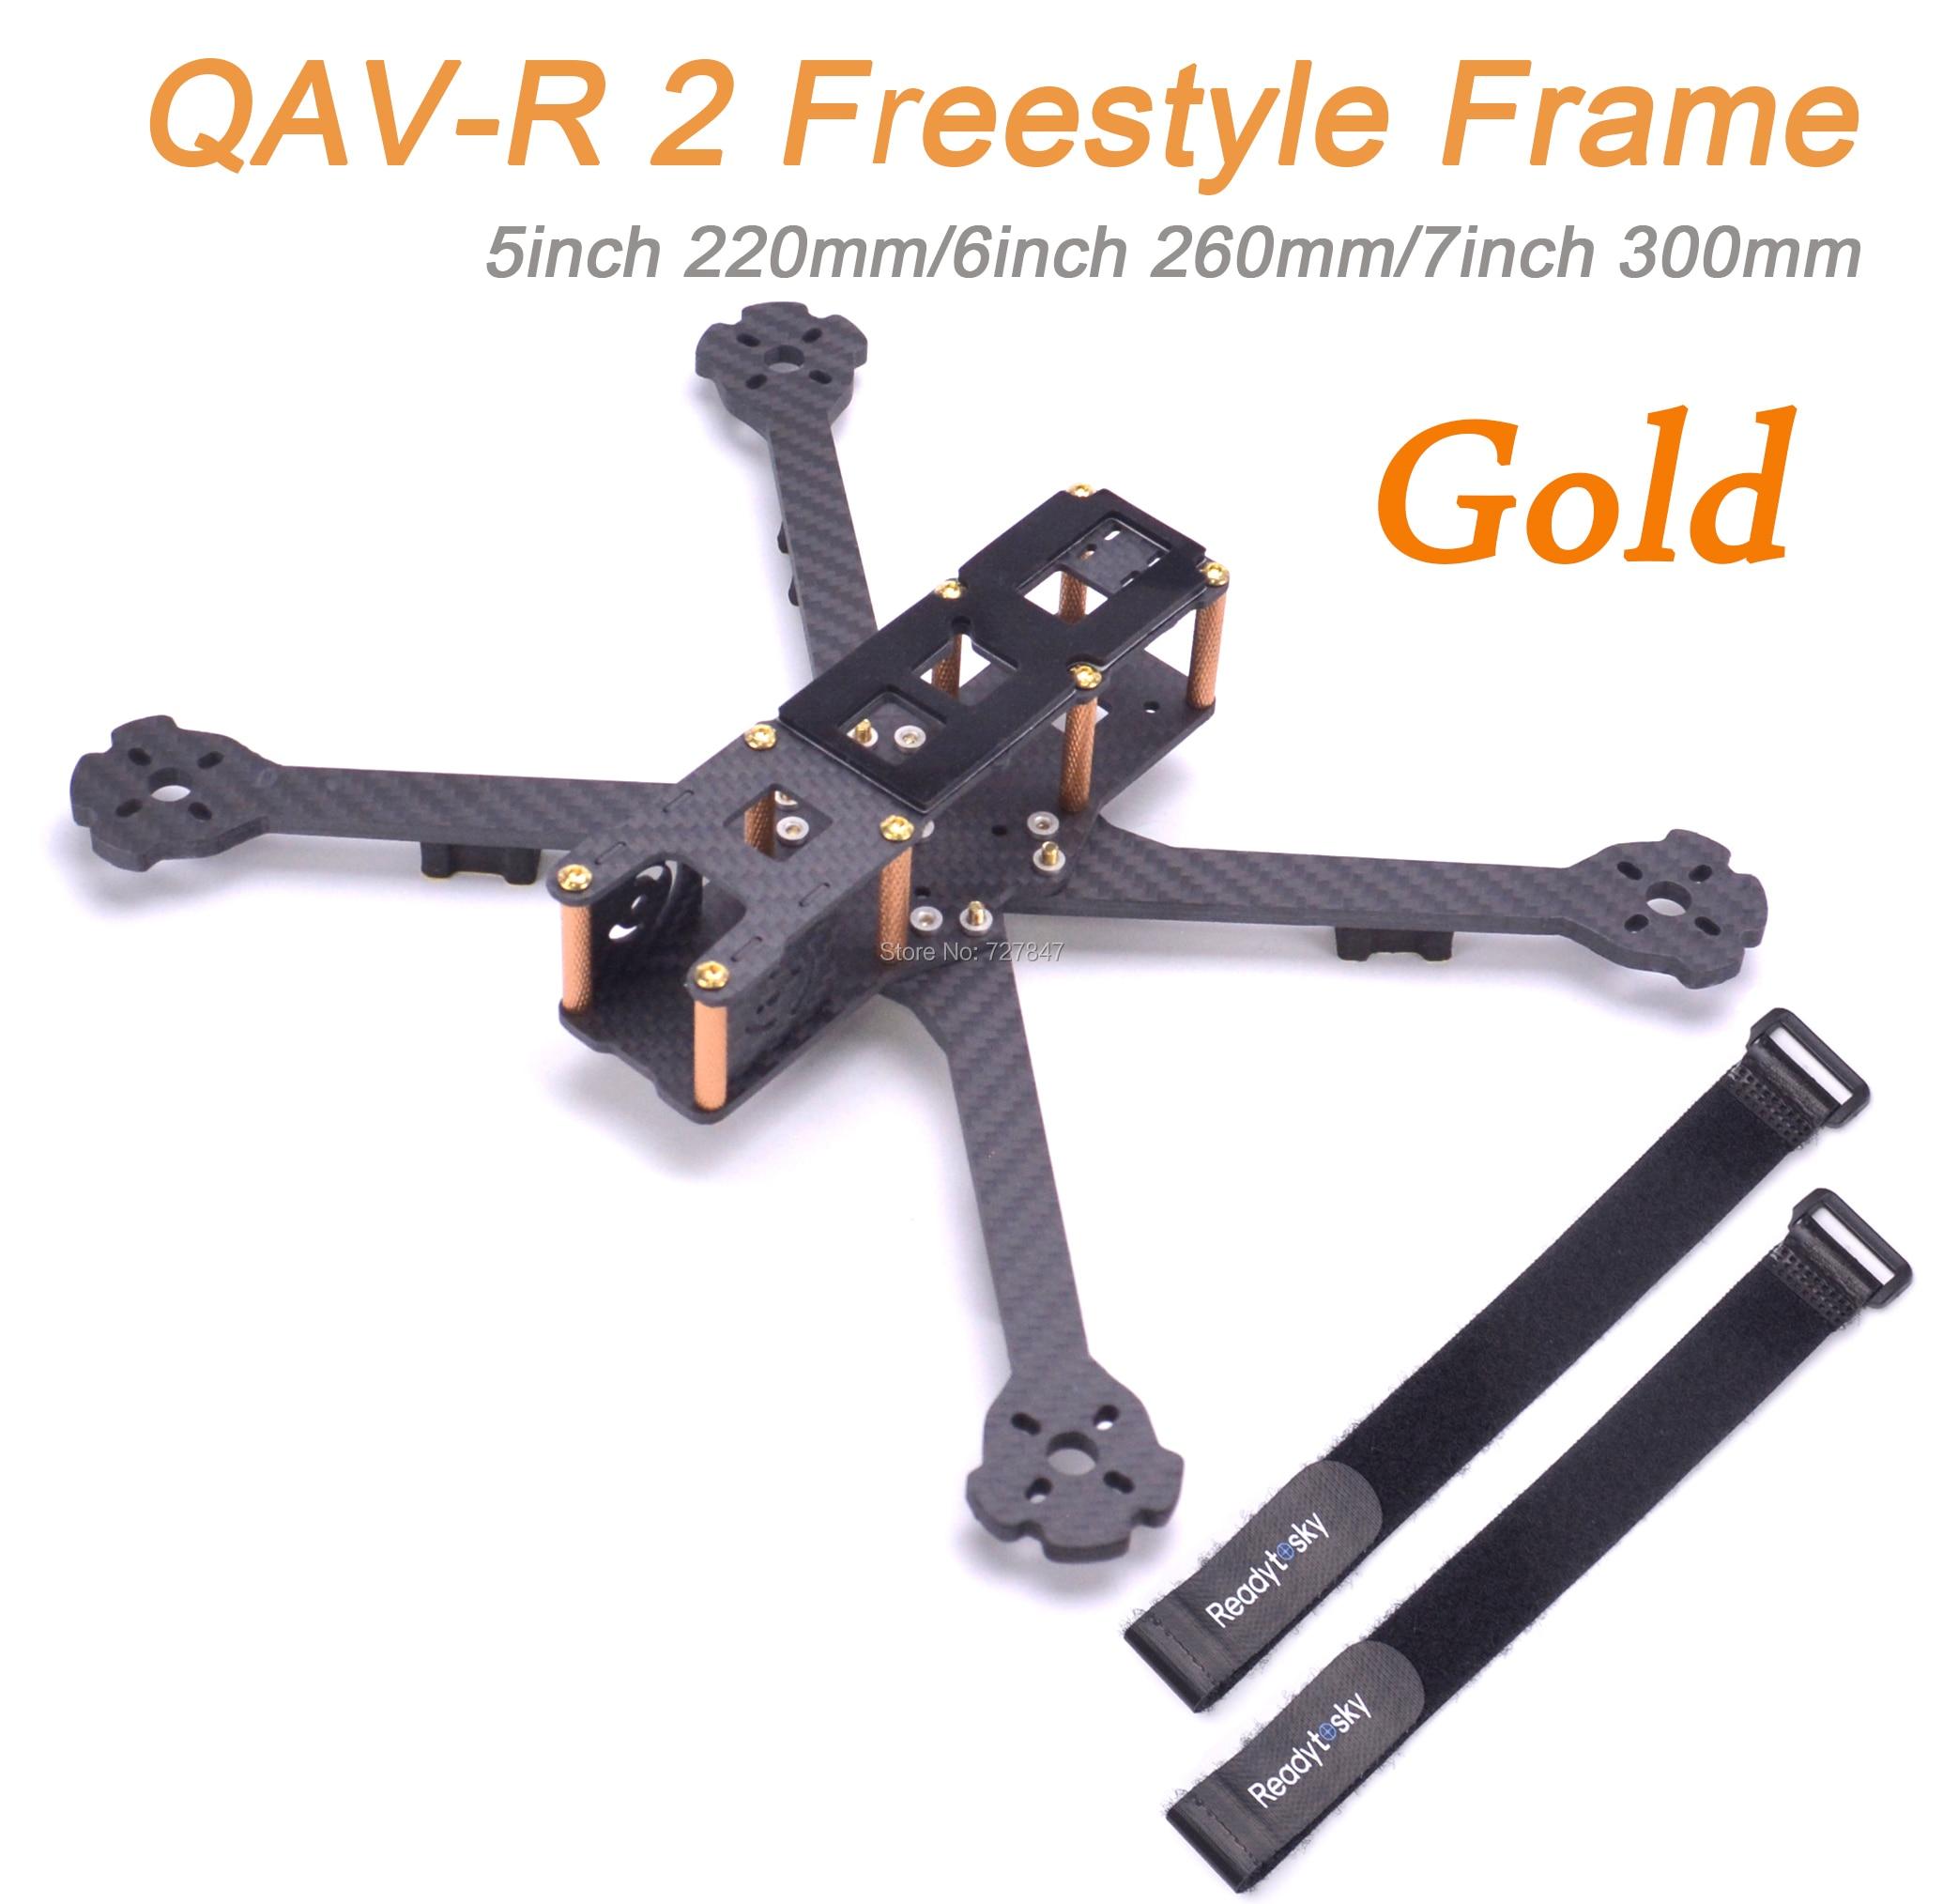 Upgrade QAV R 2 II 5inch 220mm 6inch 260mm 7inch 300mm Freestyle Quadcopter Frame DIY Mini FPV Pure Carbon Fiber Racing Drone